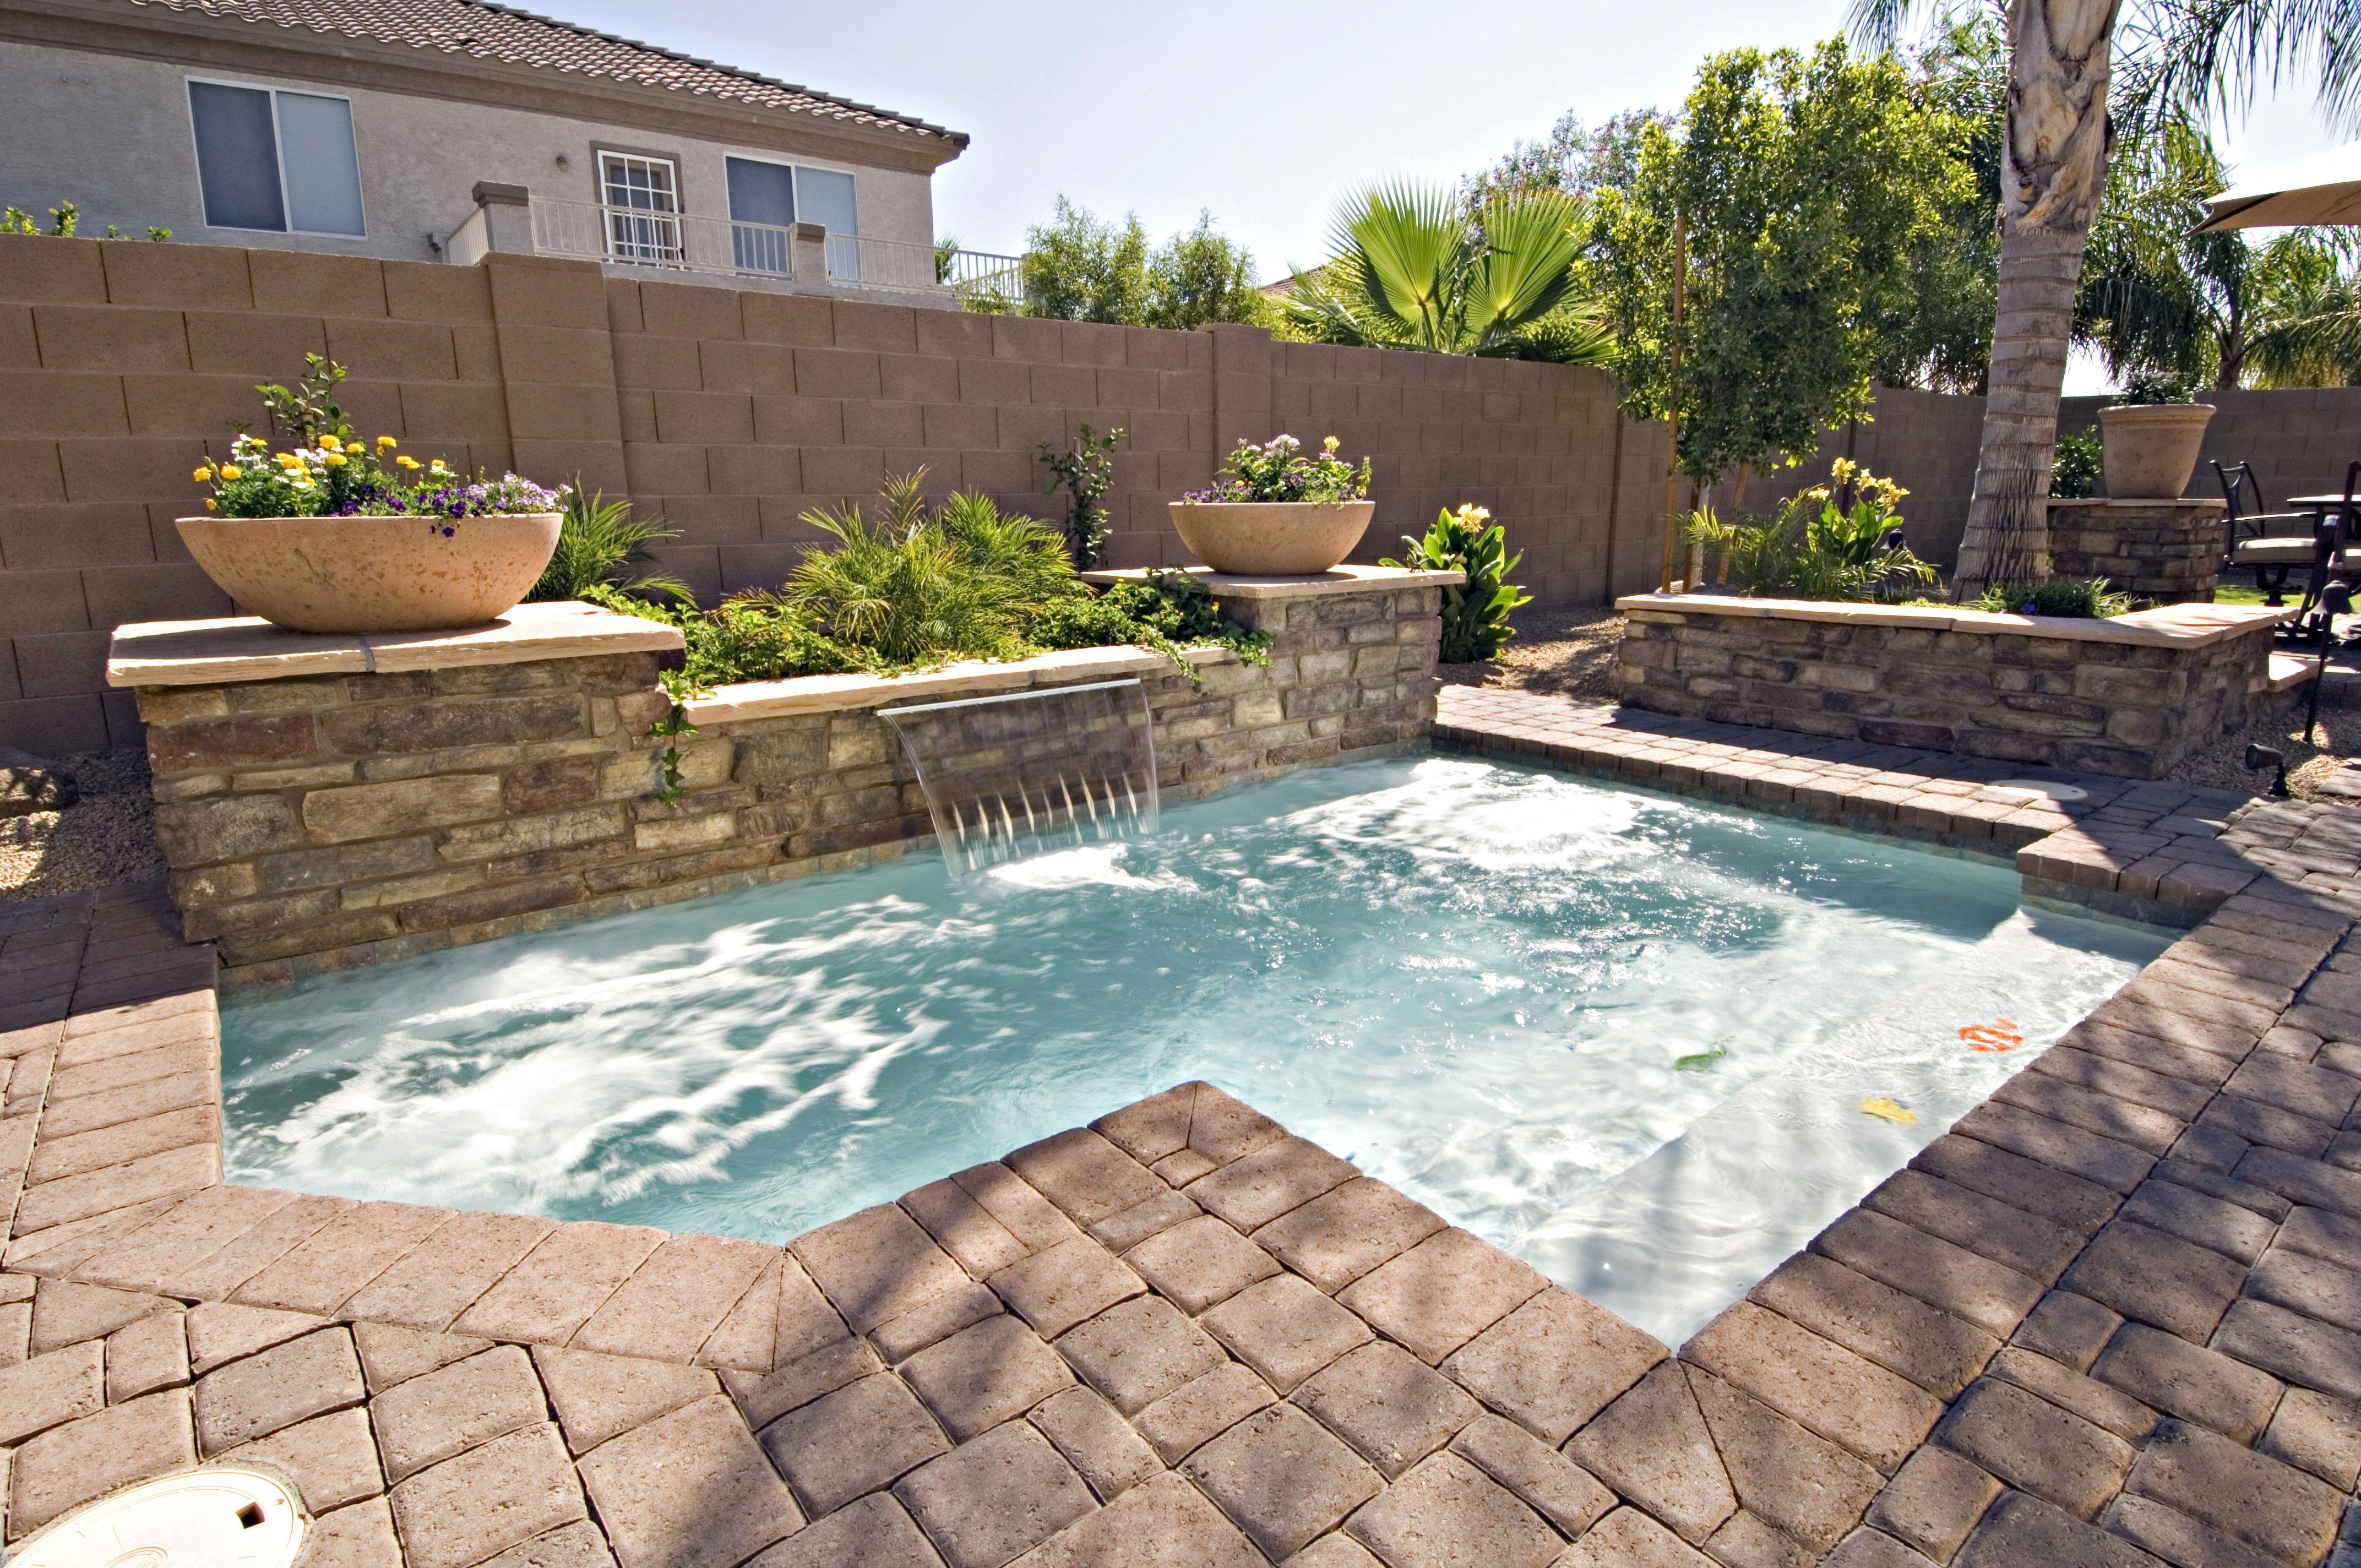 Pool design for small backyard backyard pool ruinscape in